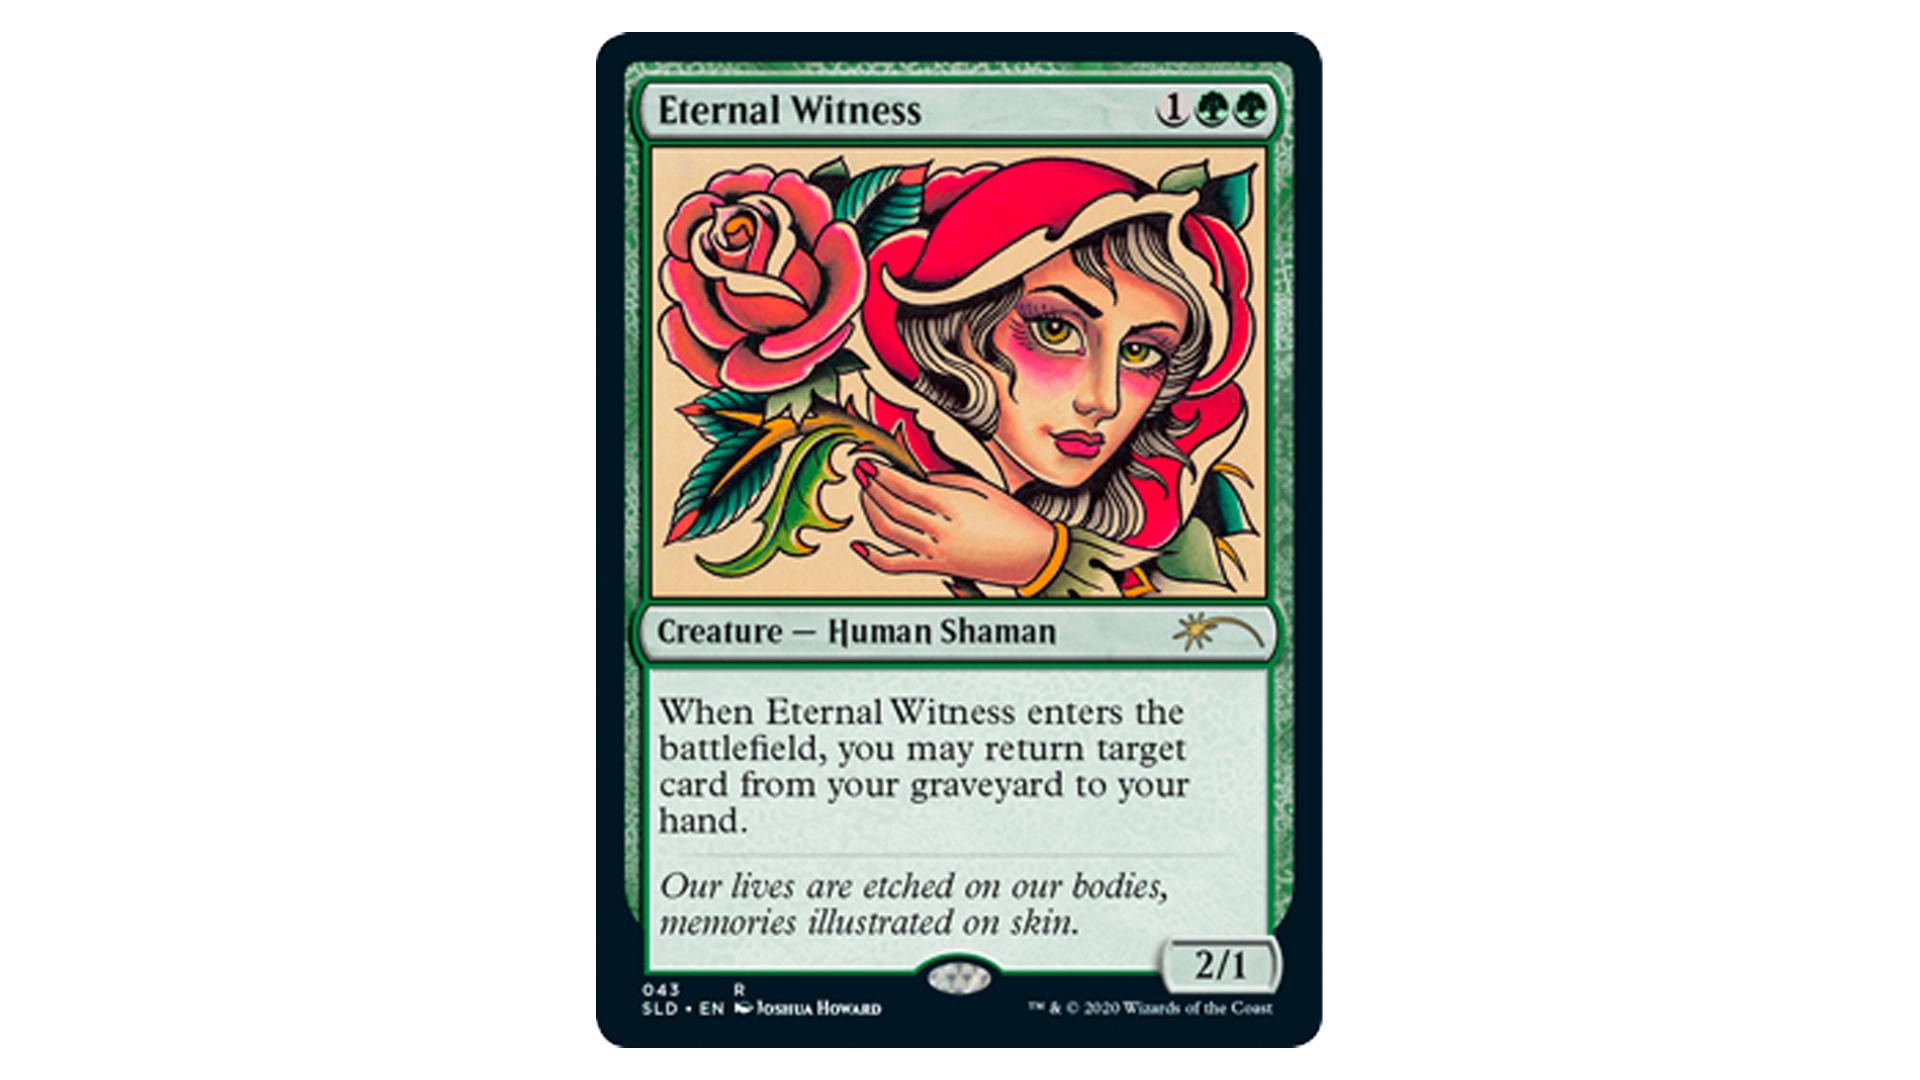 mtg-card-eternal-witness.png